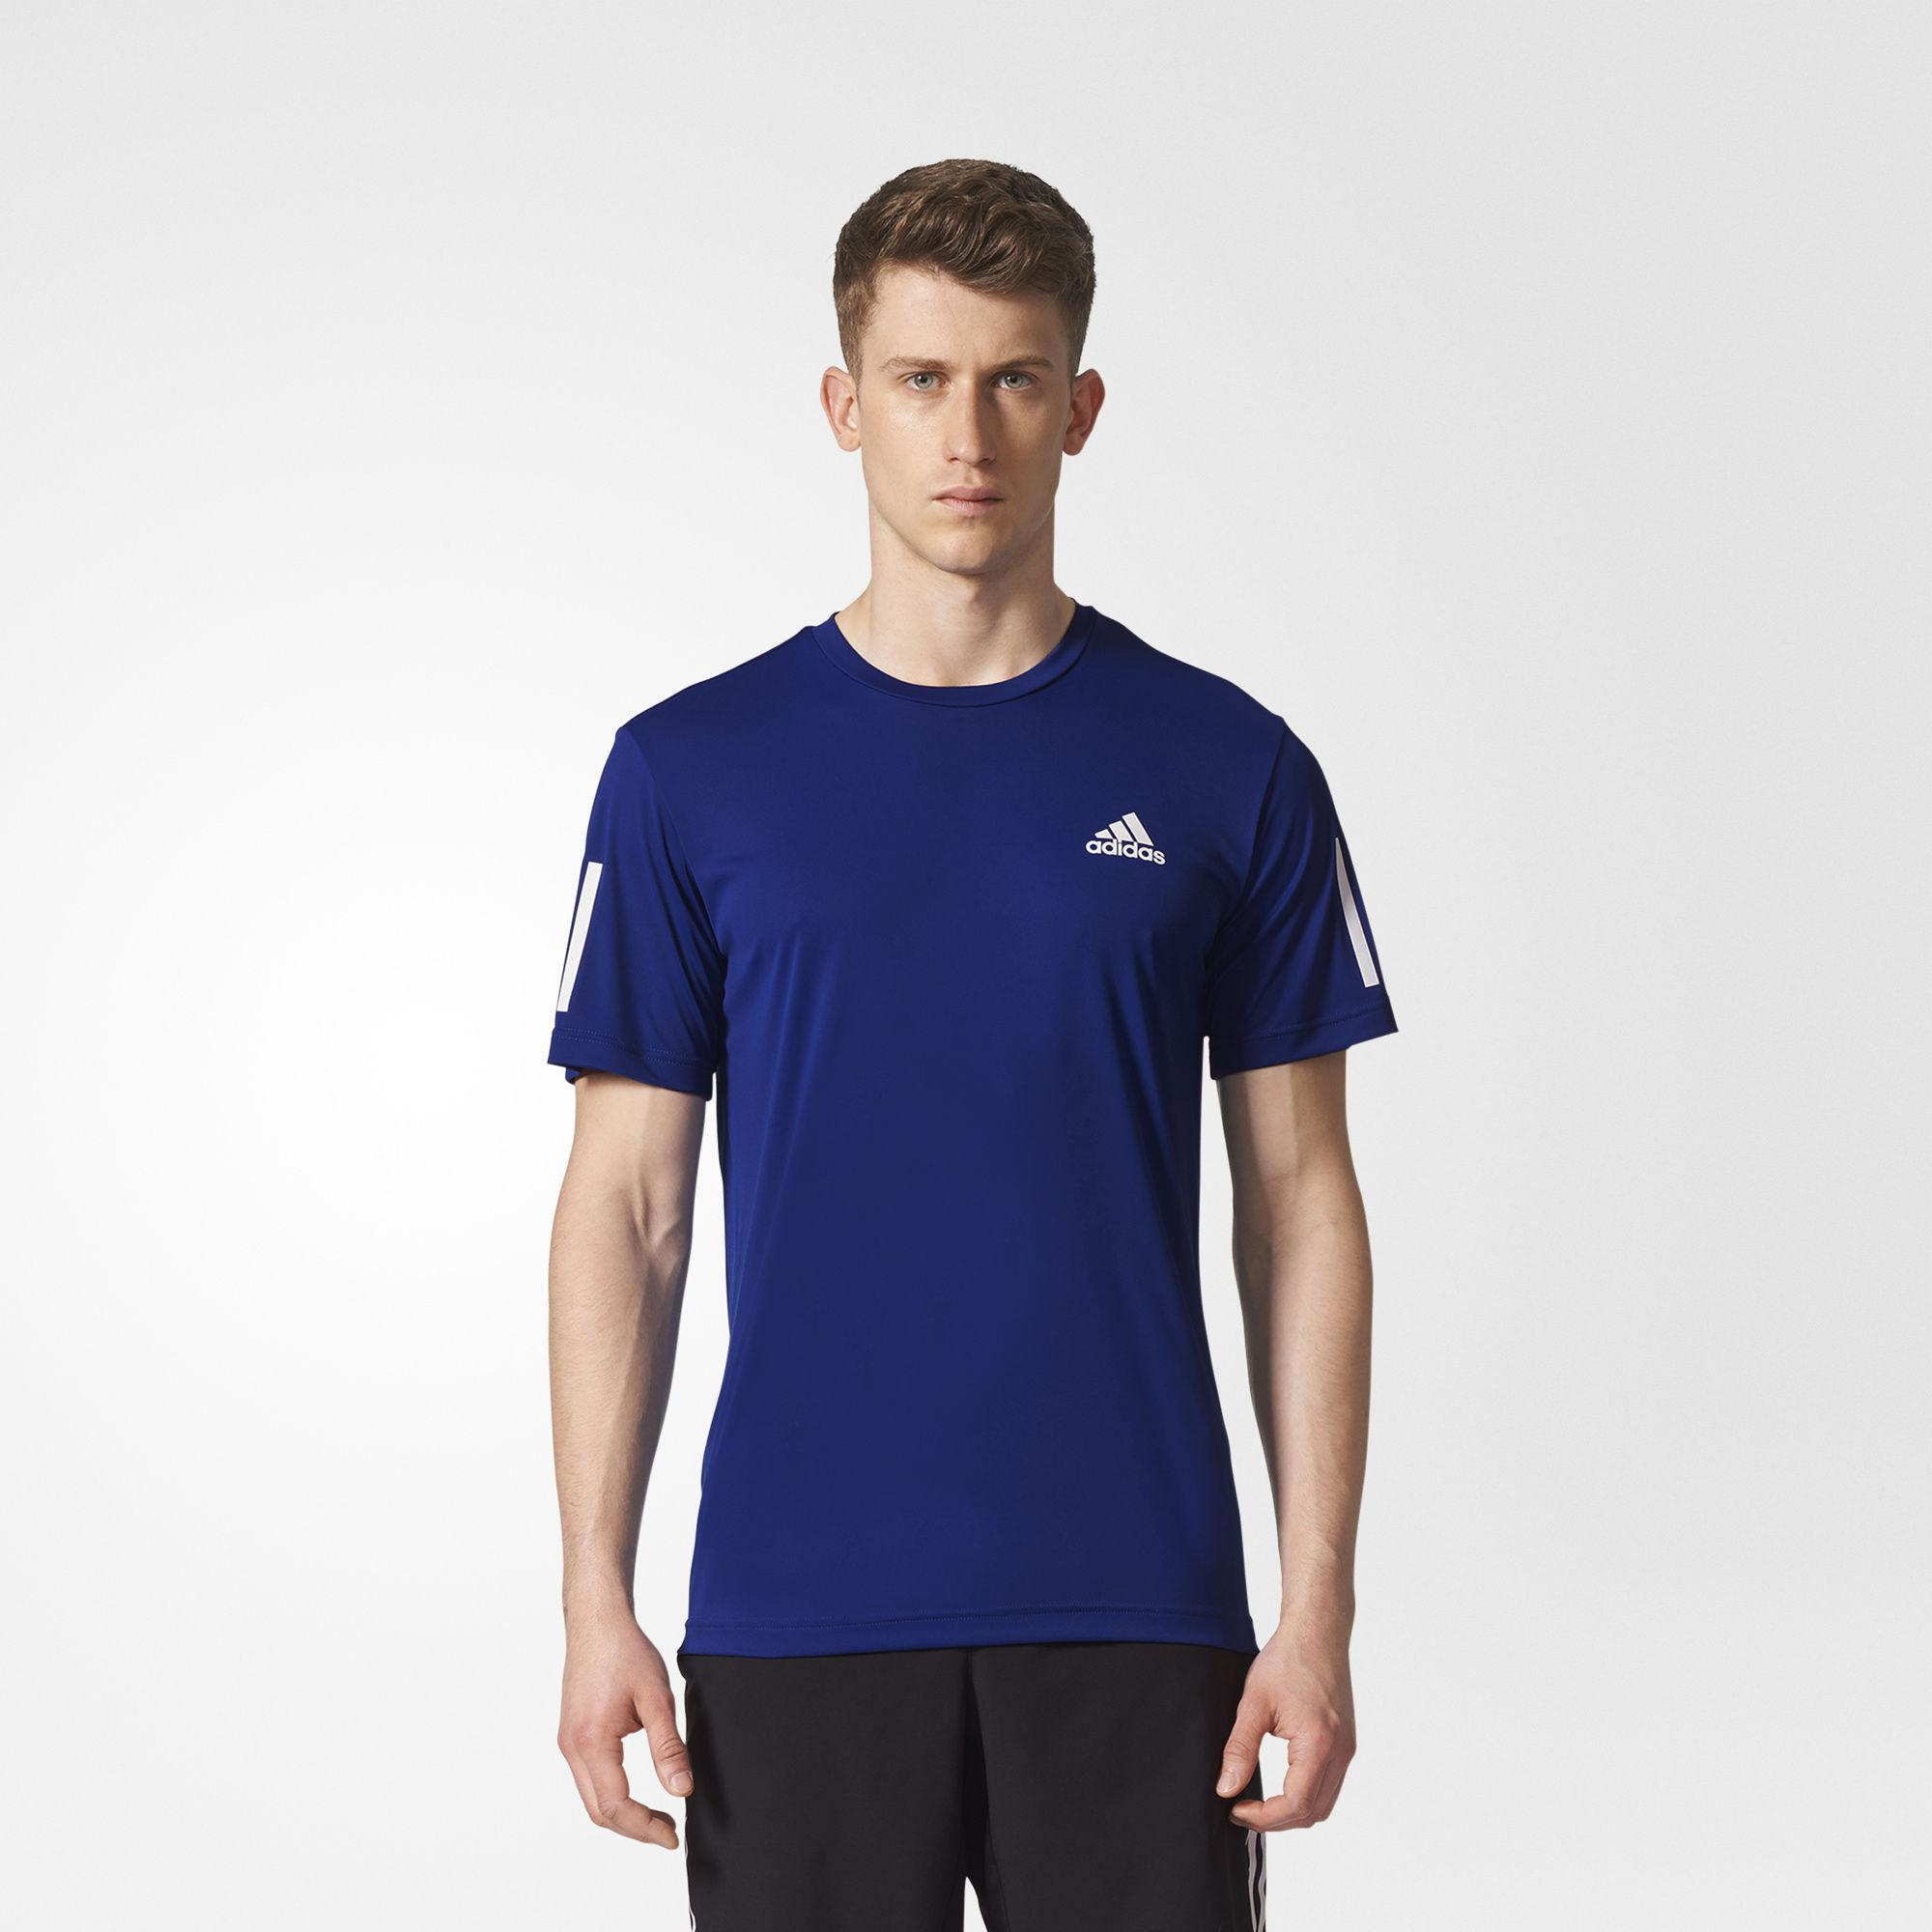 25e0a7a6783 Adidas Mens Club Tee - Mystery Ink Blue - Tennisnuts.com